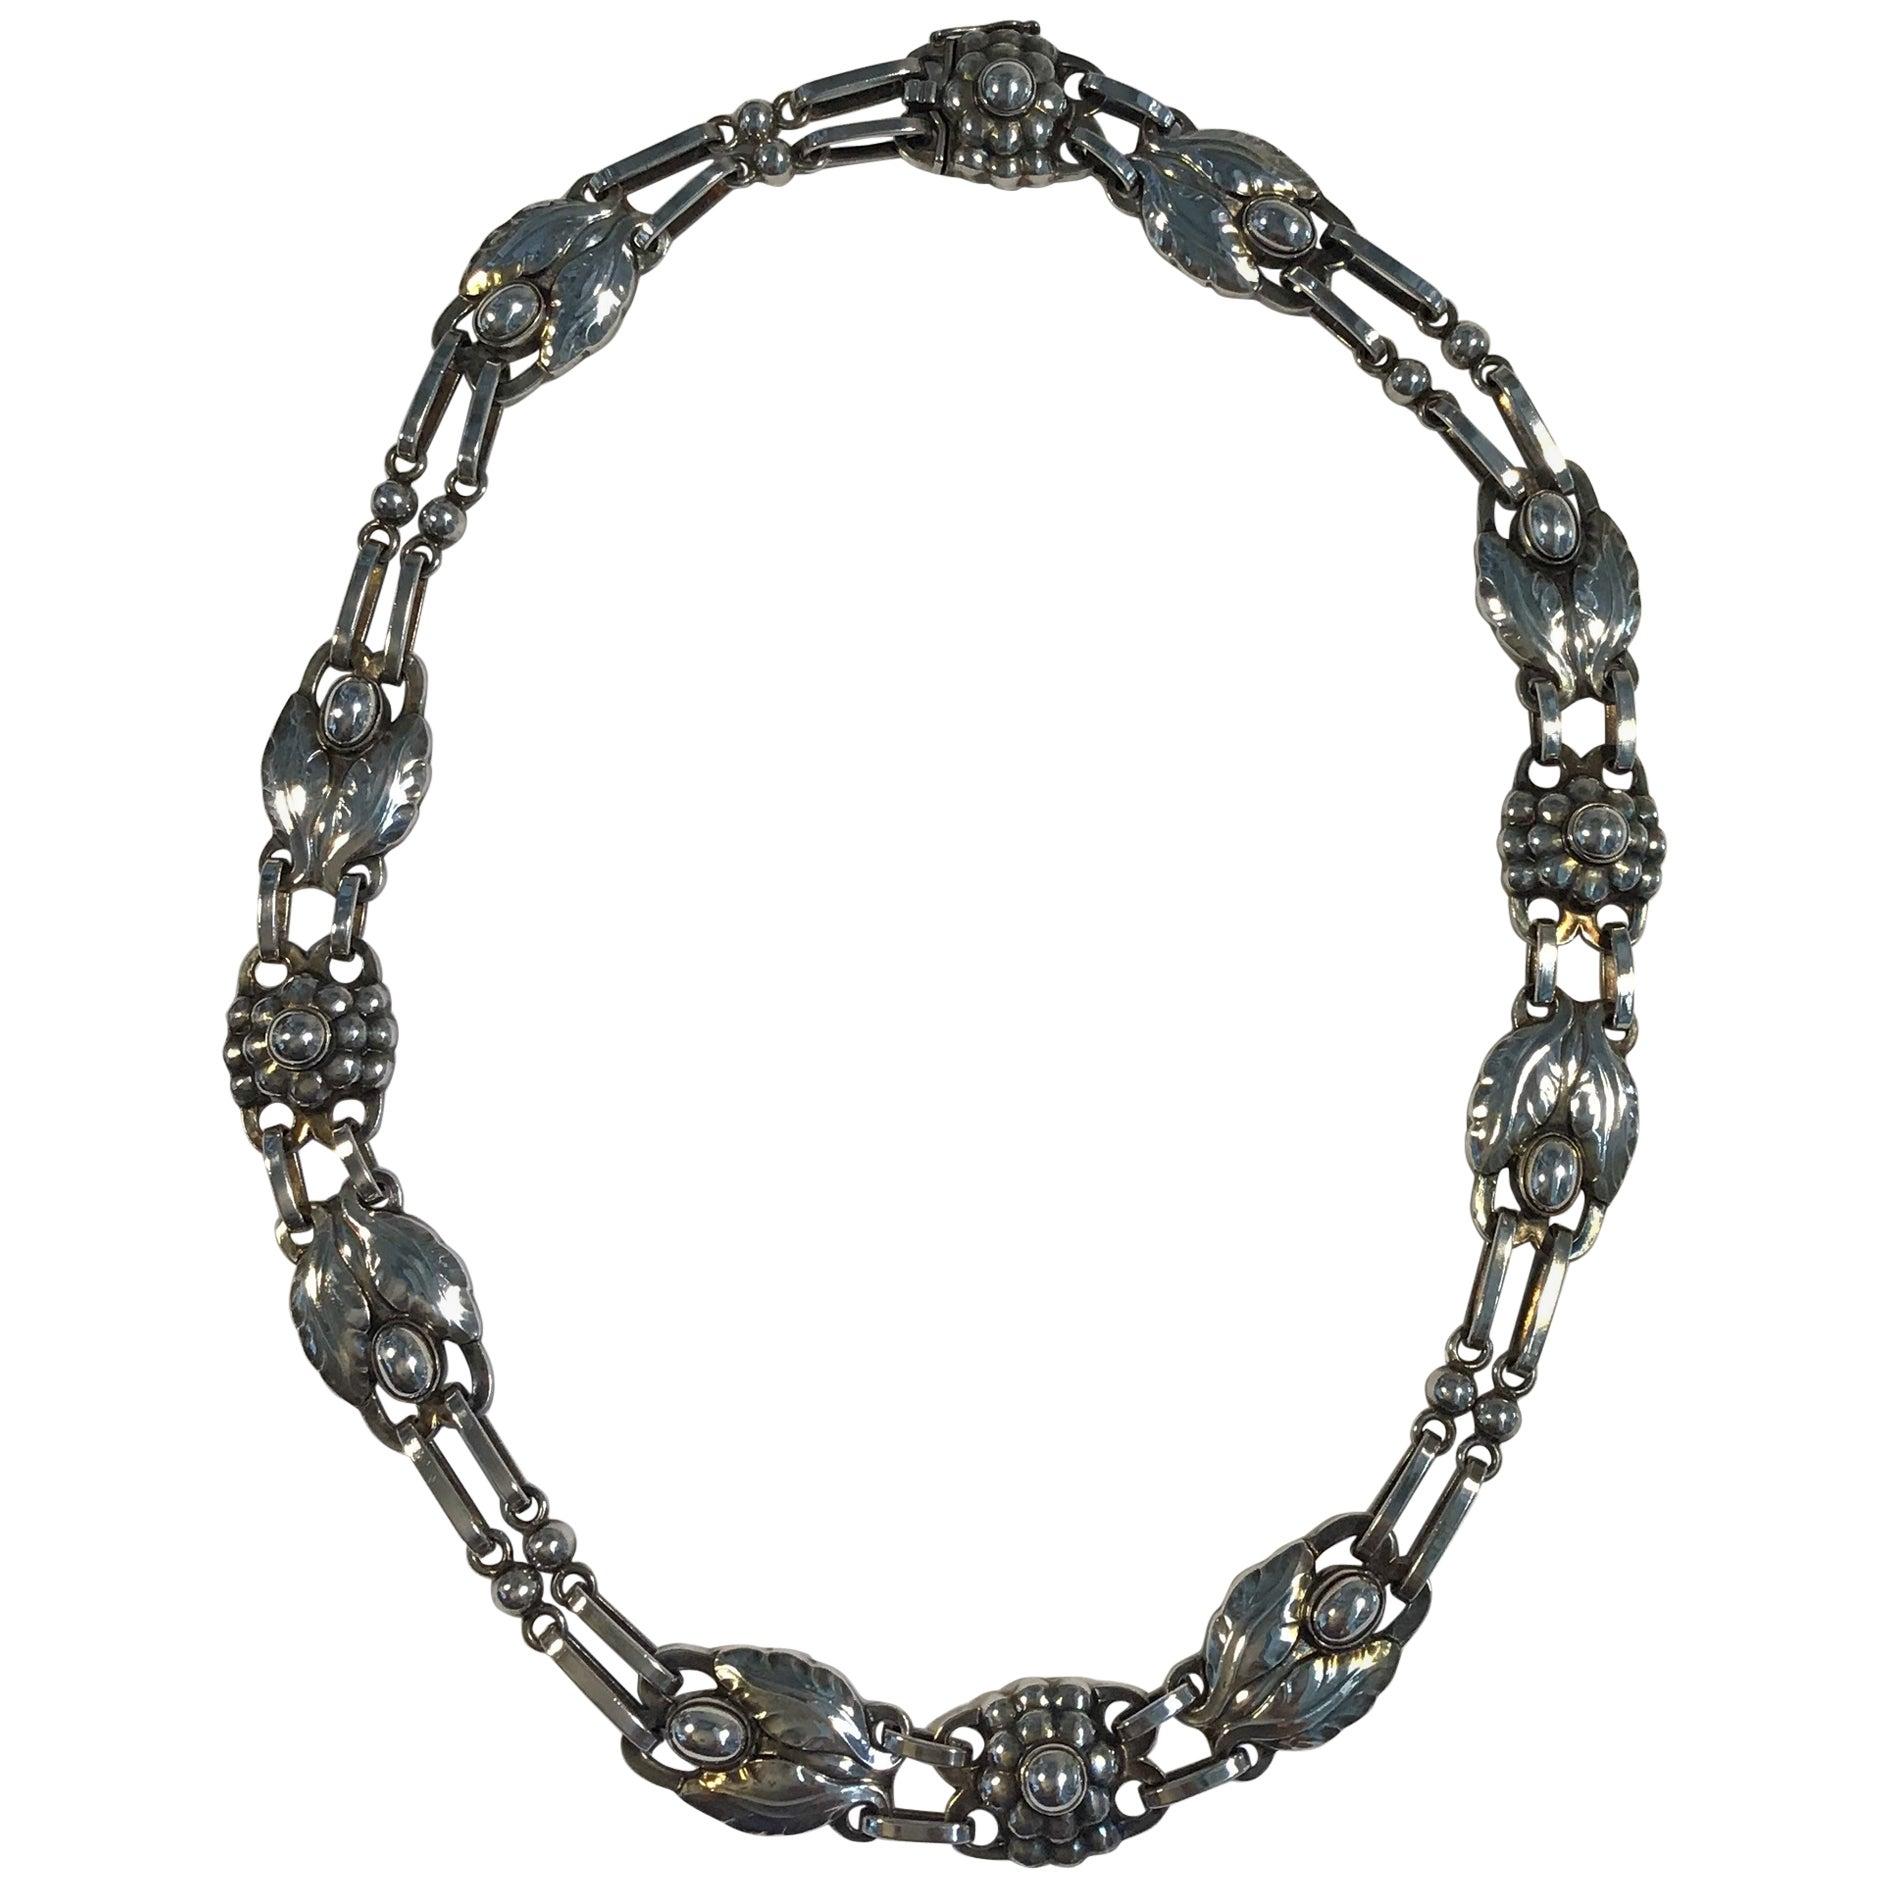 Georg Jensen Sterling Silver Necklace No. 1